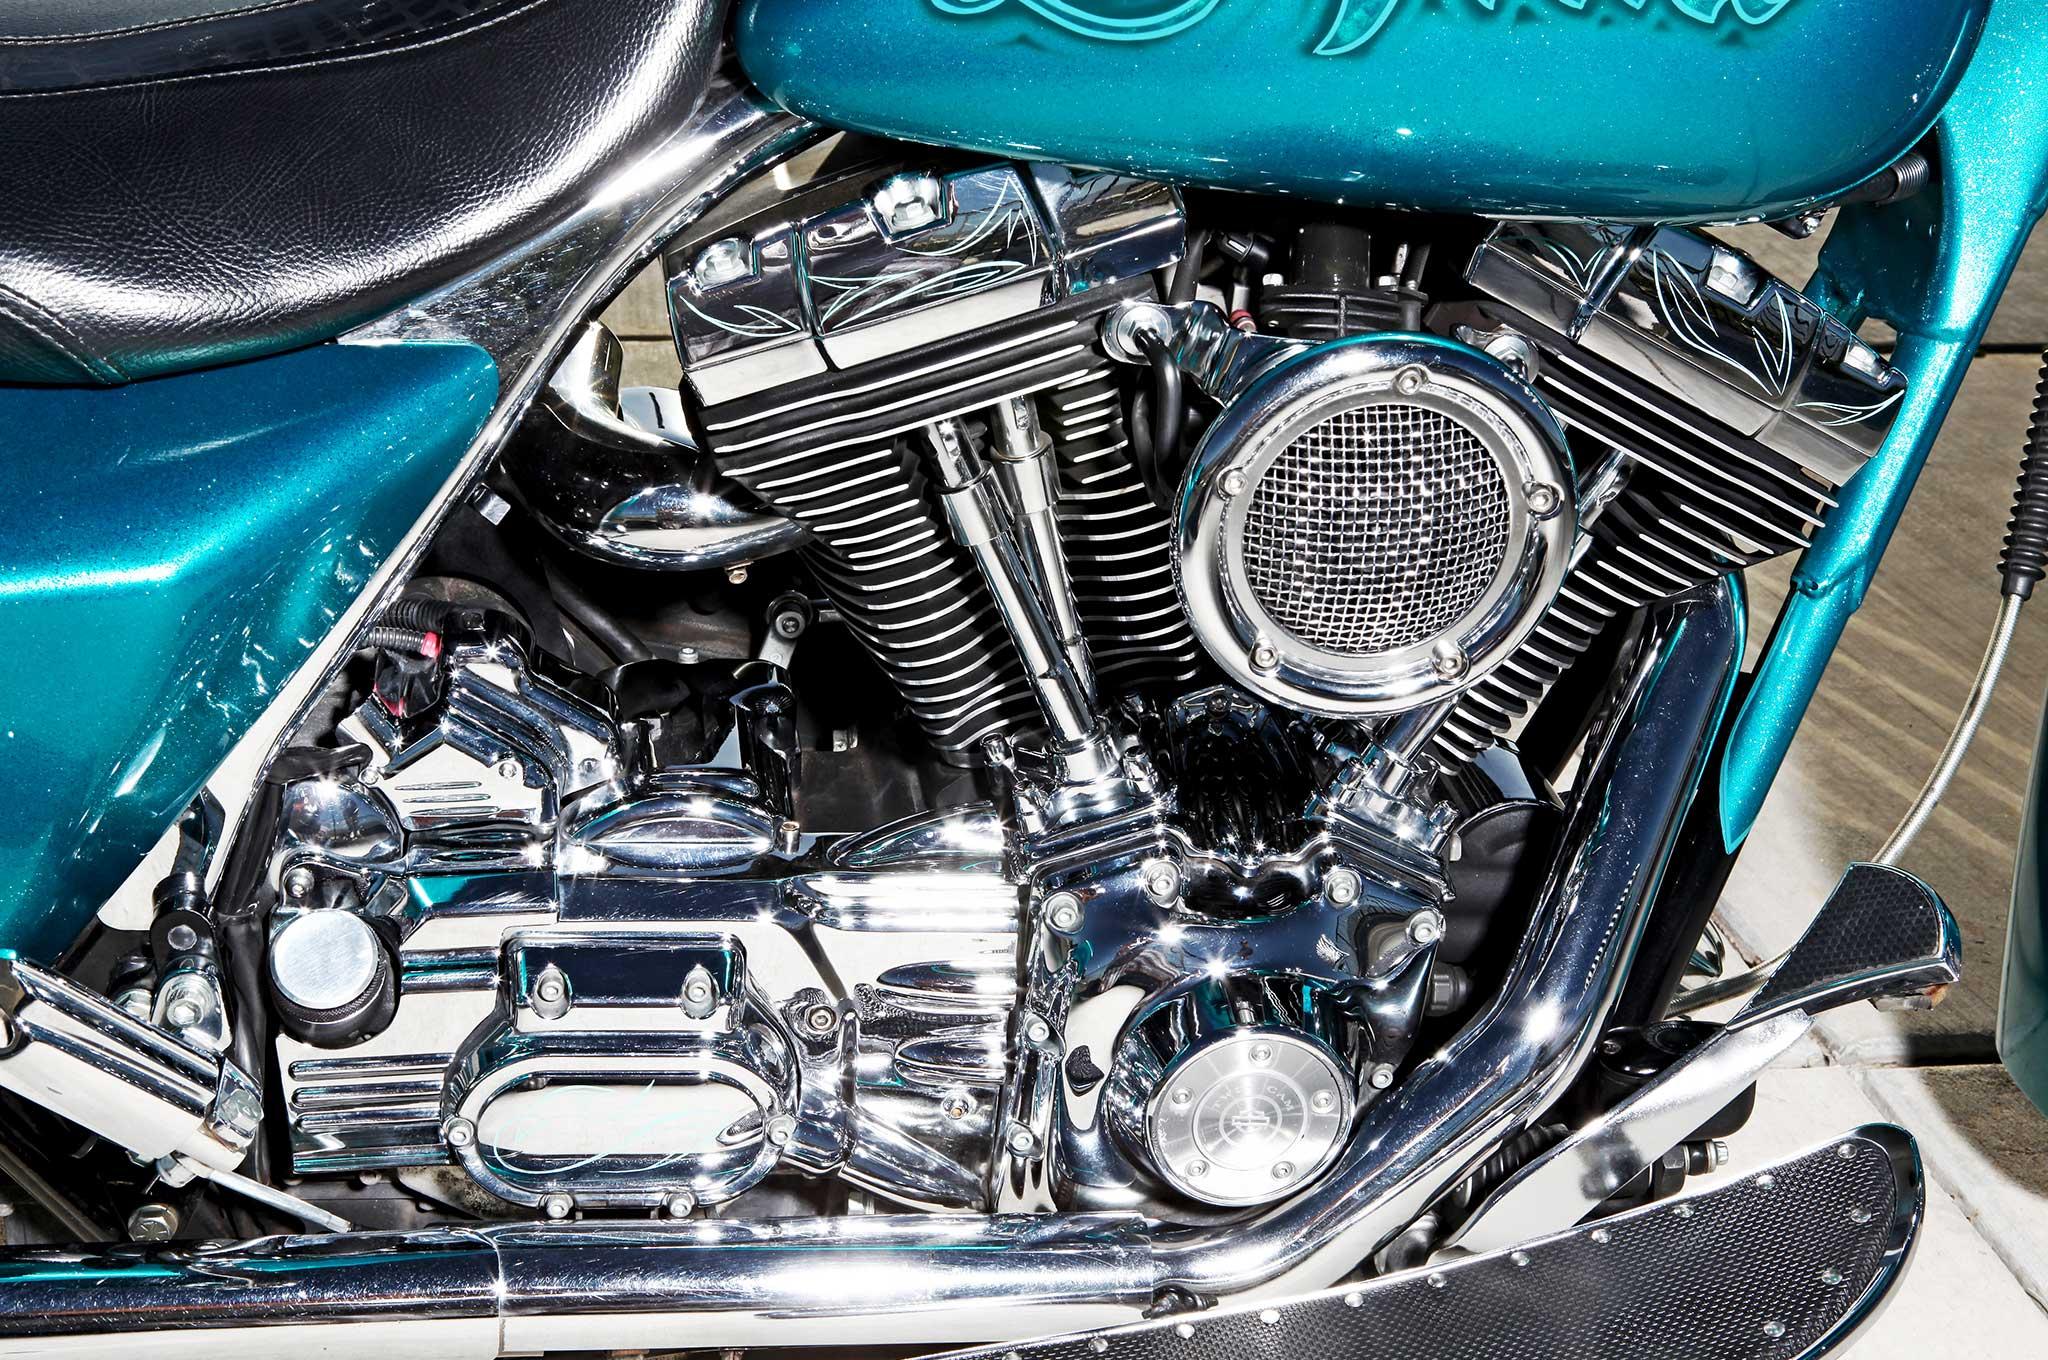 2004 harley davidson road king 88ci engine 017